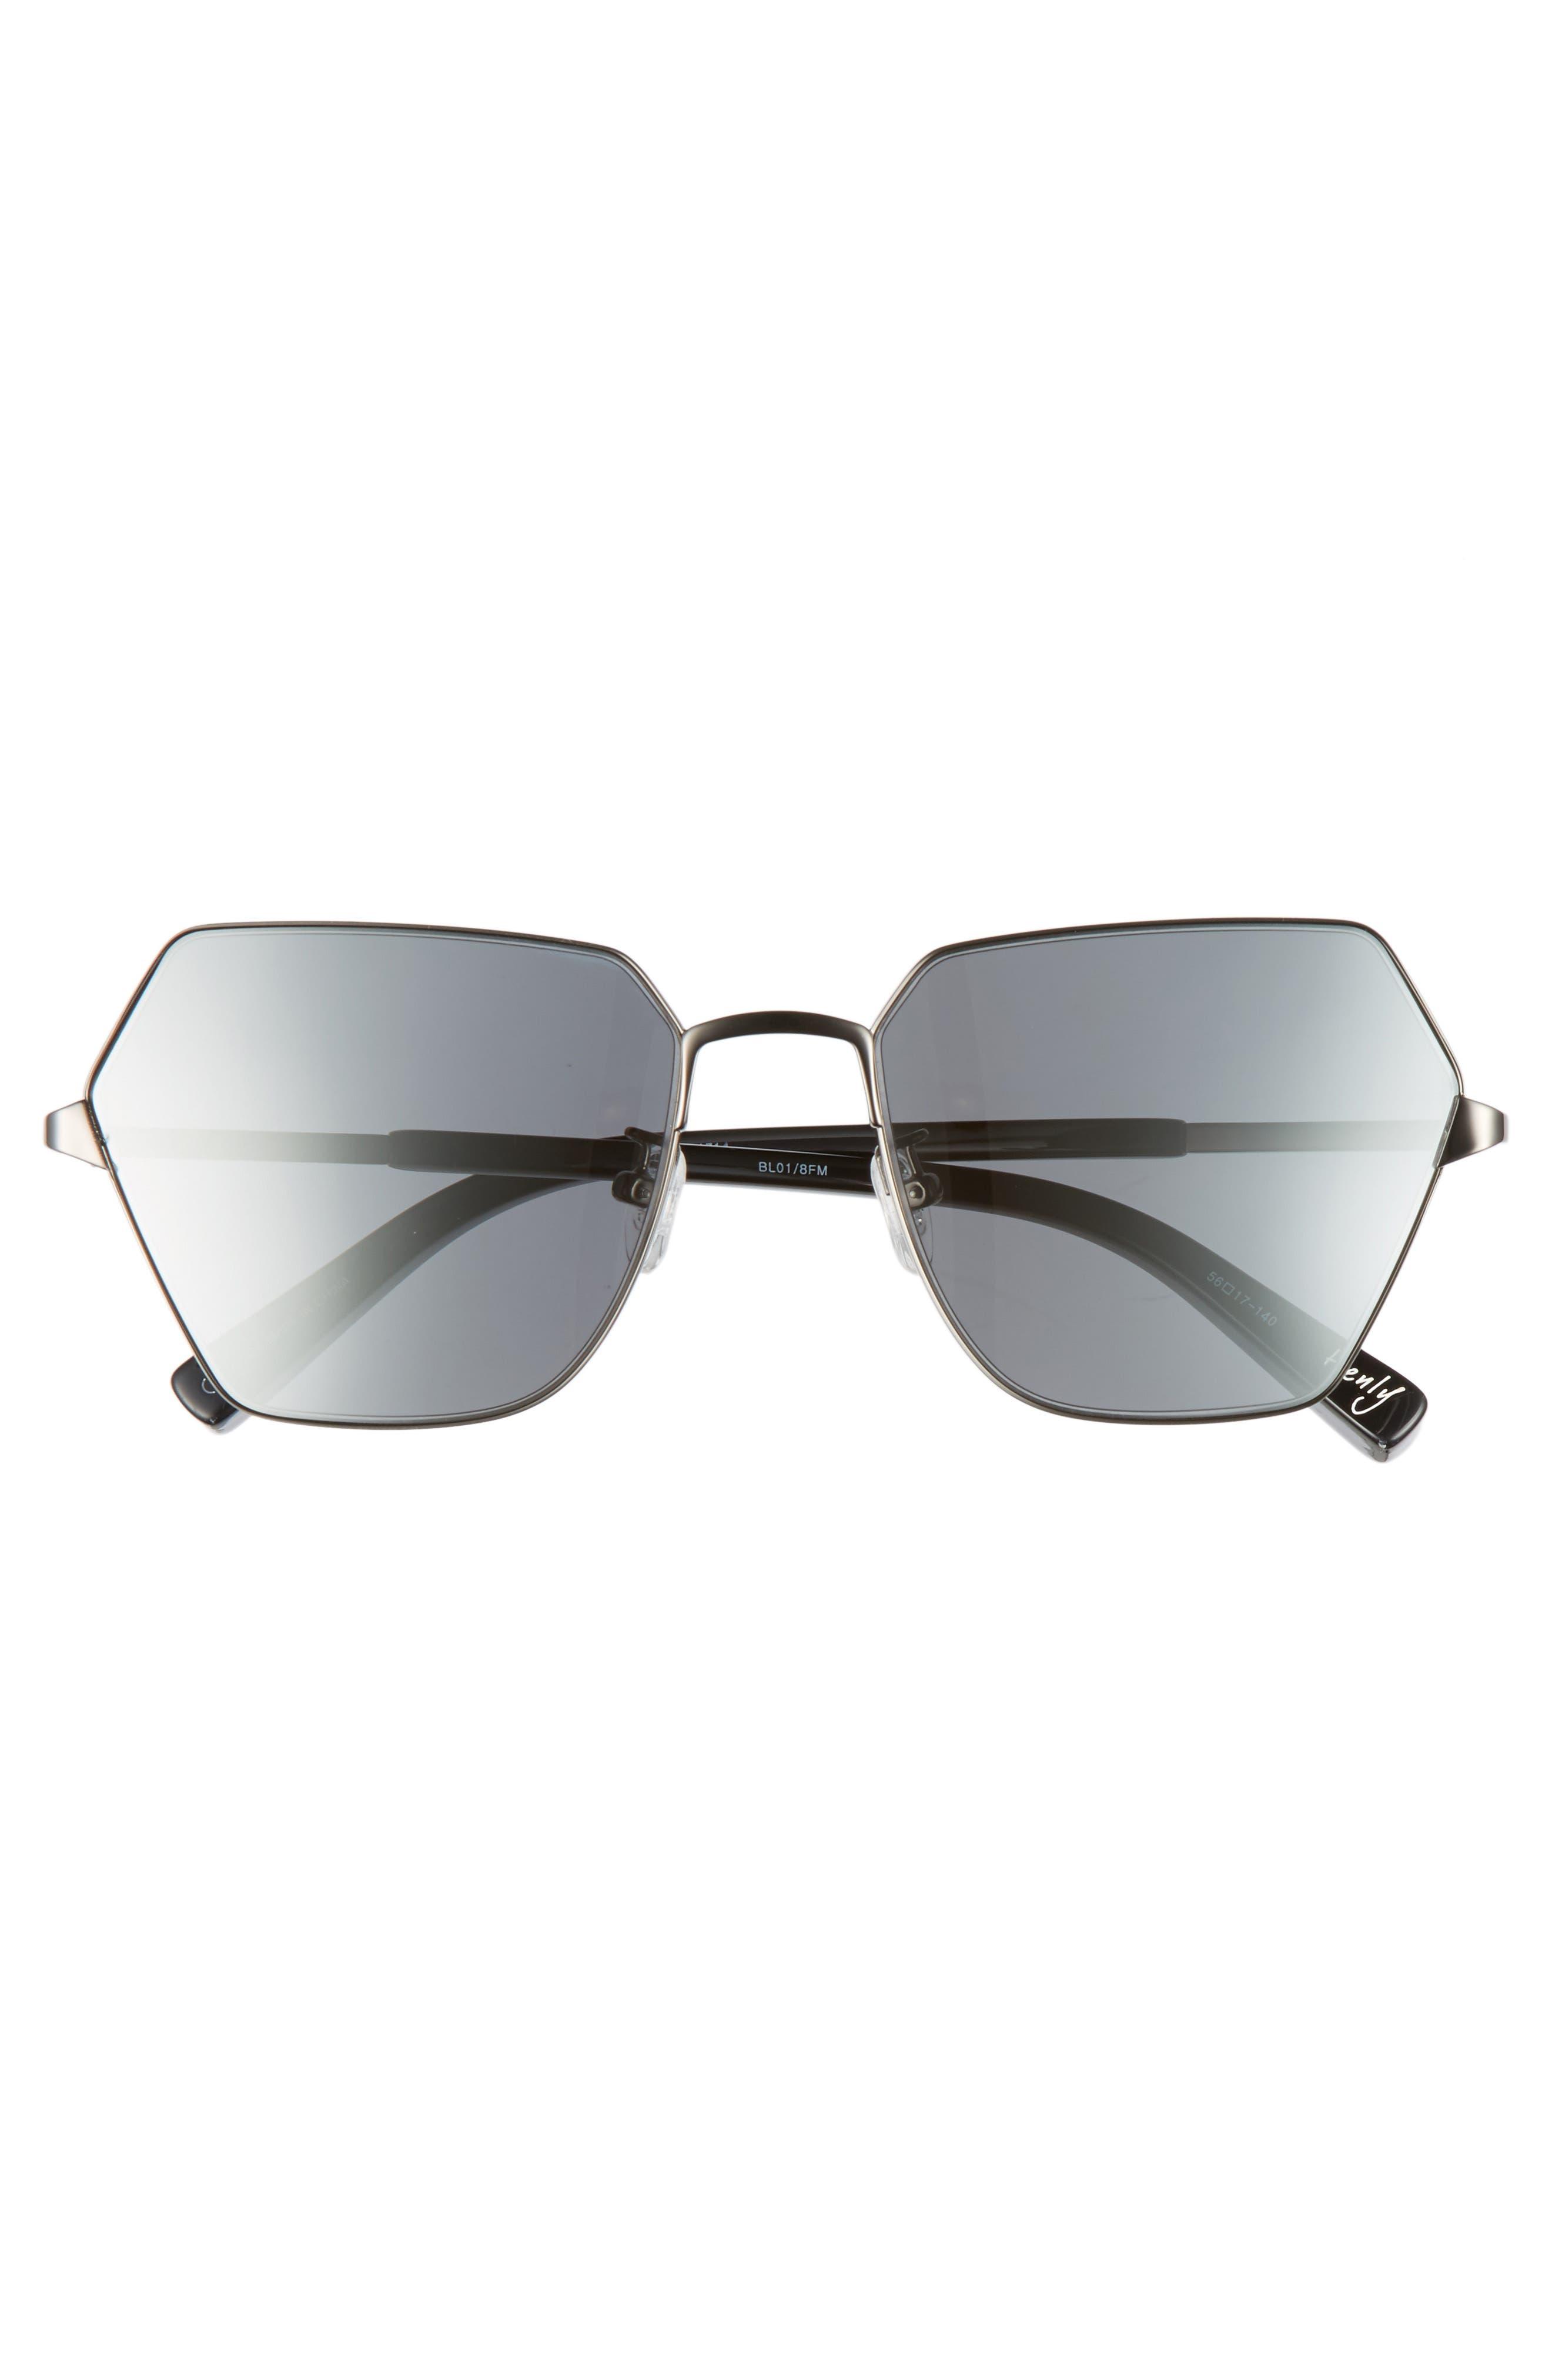 Henly 56mm Sunglasses,                             Alternate thumbnail 3, color,                             001